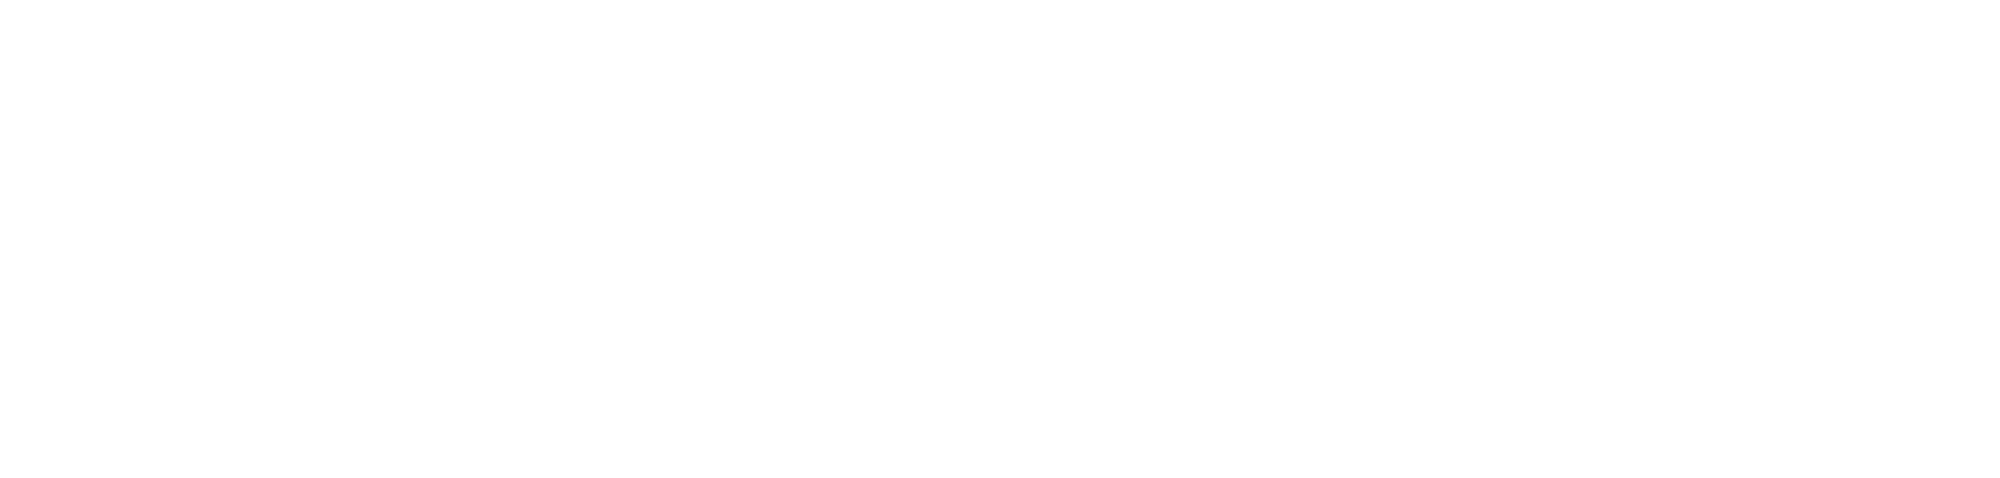 47 Hall Communications